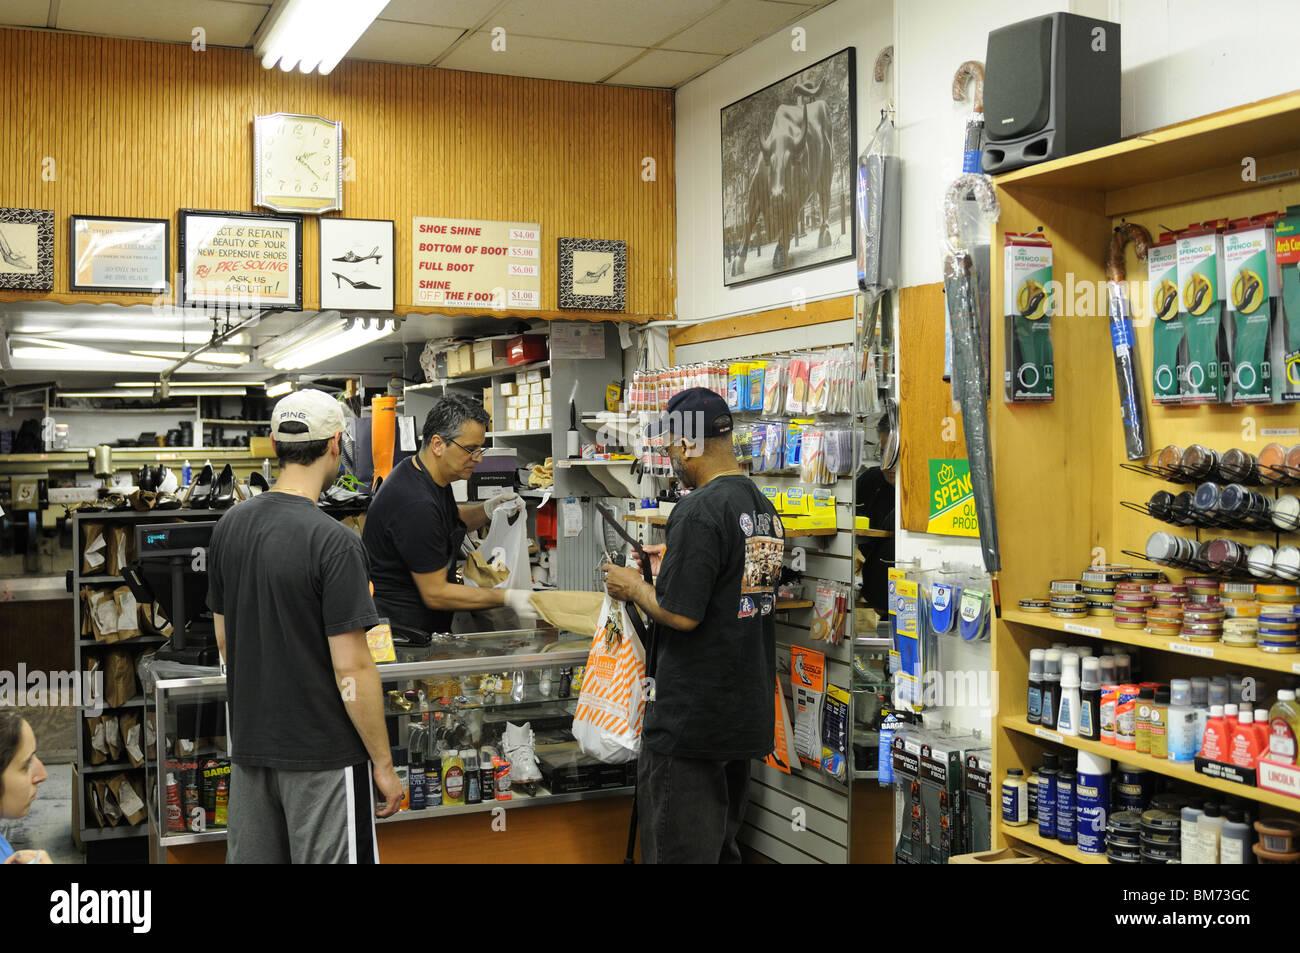 f22e2926c9405 A shoe repair shop in Lower Manhattan's financial district opened in ...